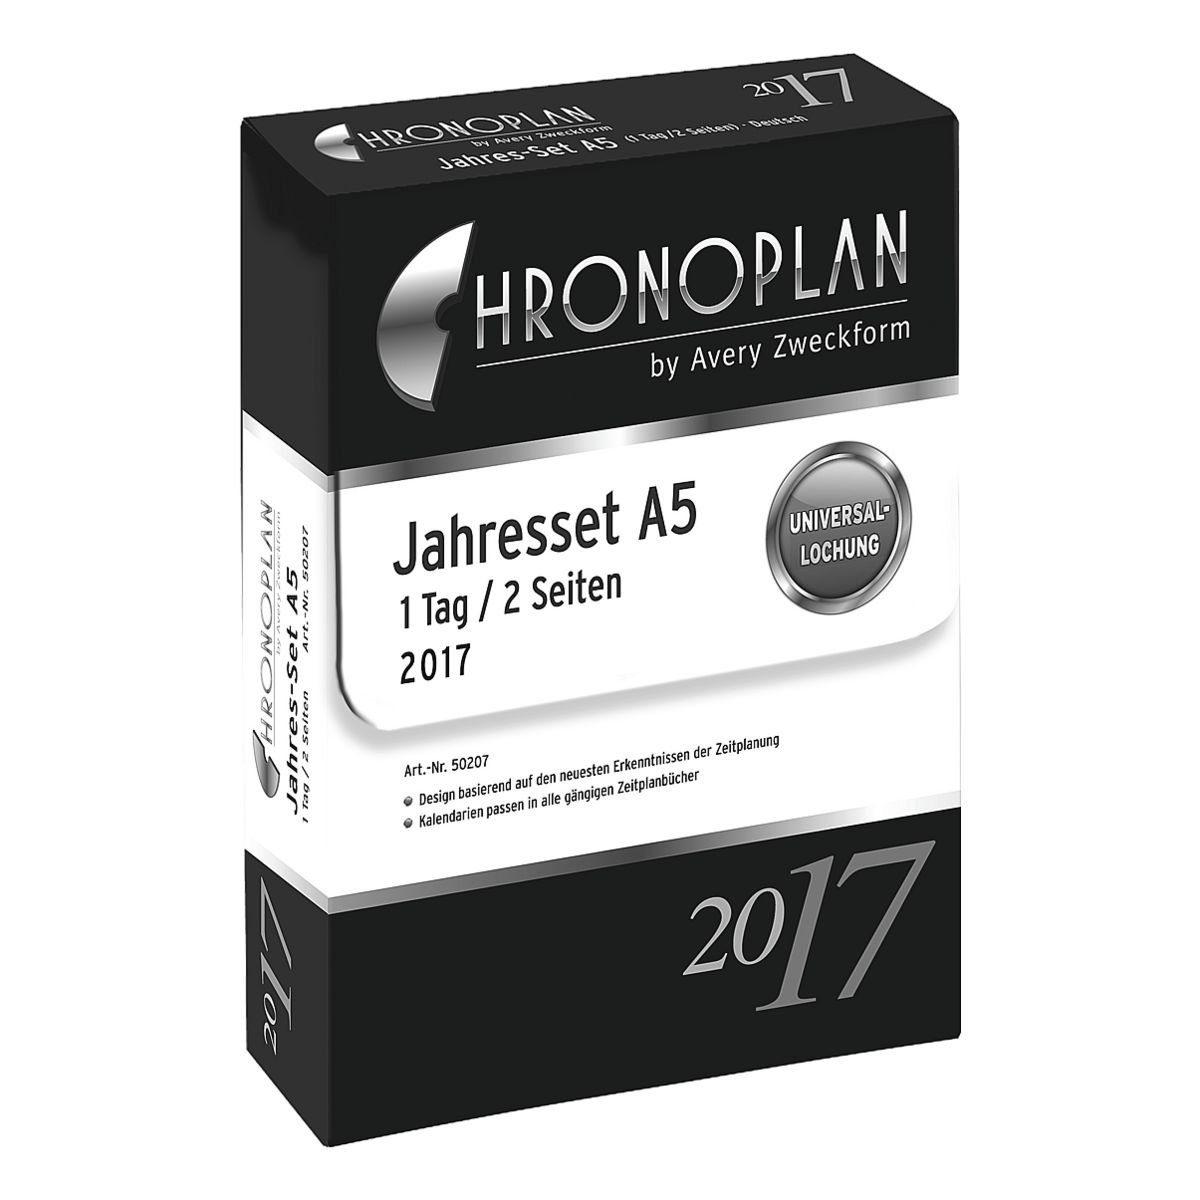 CHRONOPLAN Jahres-Set 2017